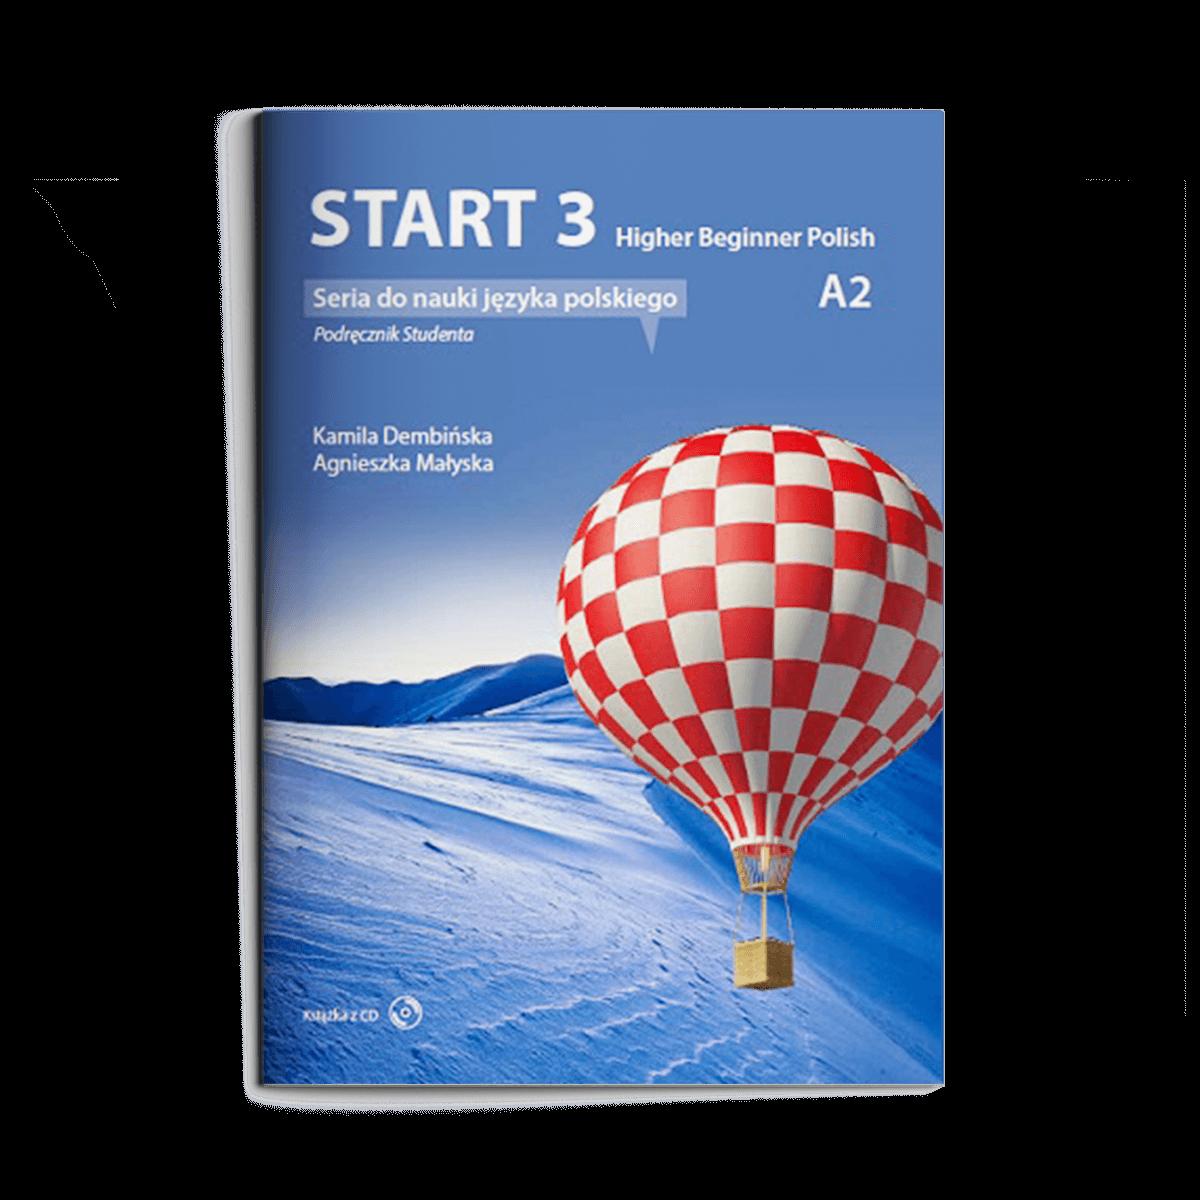 Start 3. Higher Beginner Polish. Podręcznik studenta – Flipbook